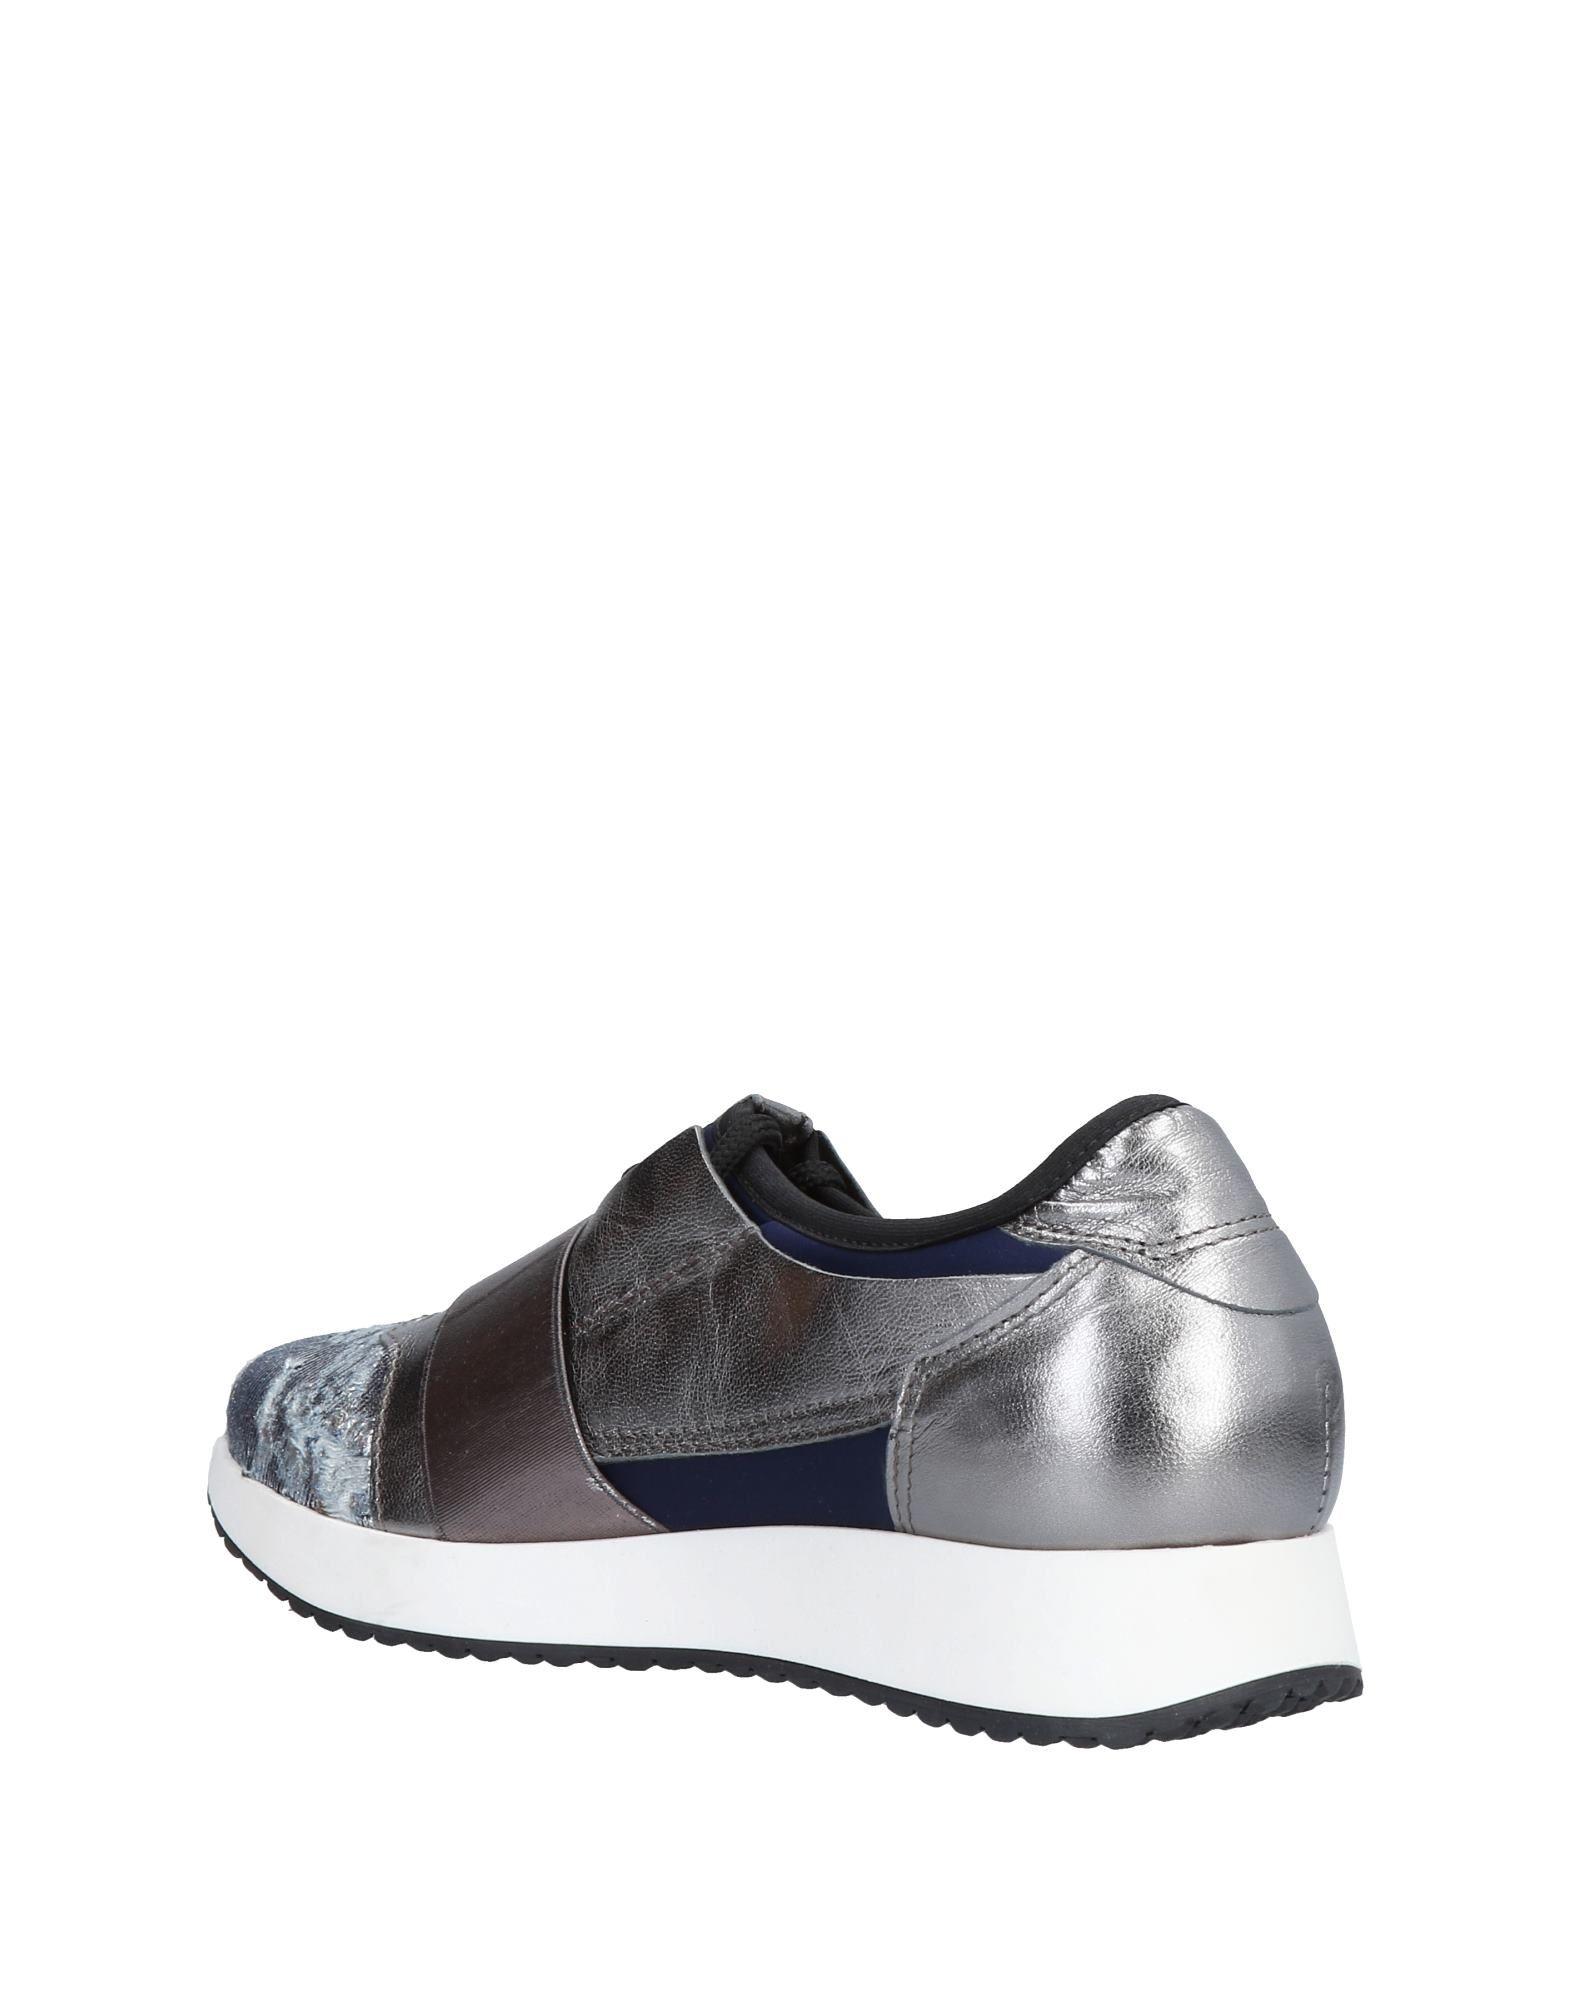 Geneve Sneakers Damen Damen Sneakers  11470284FH 854053